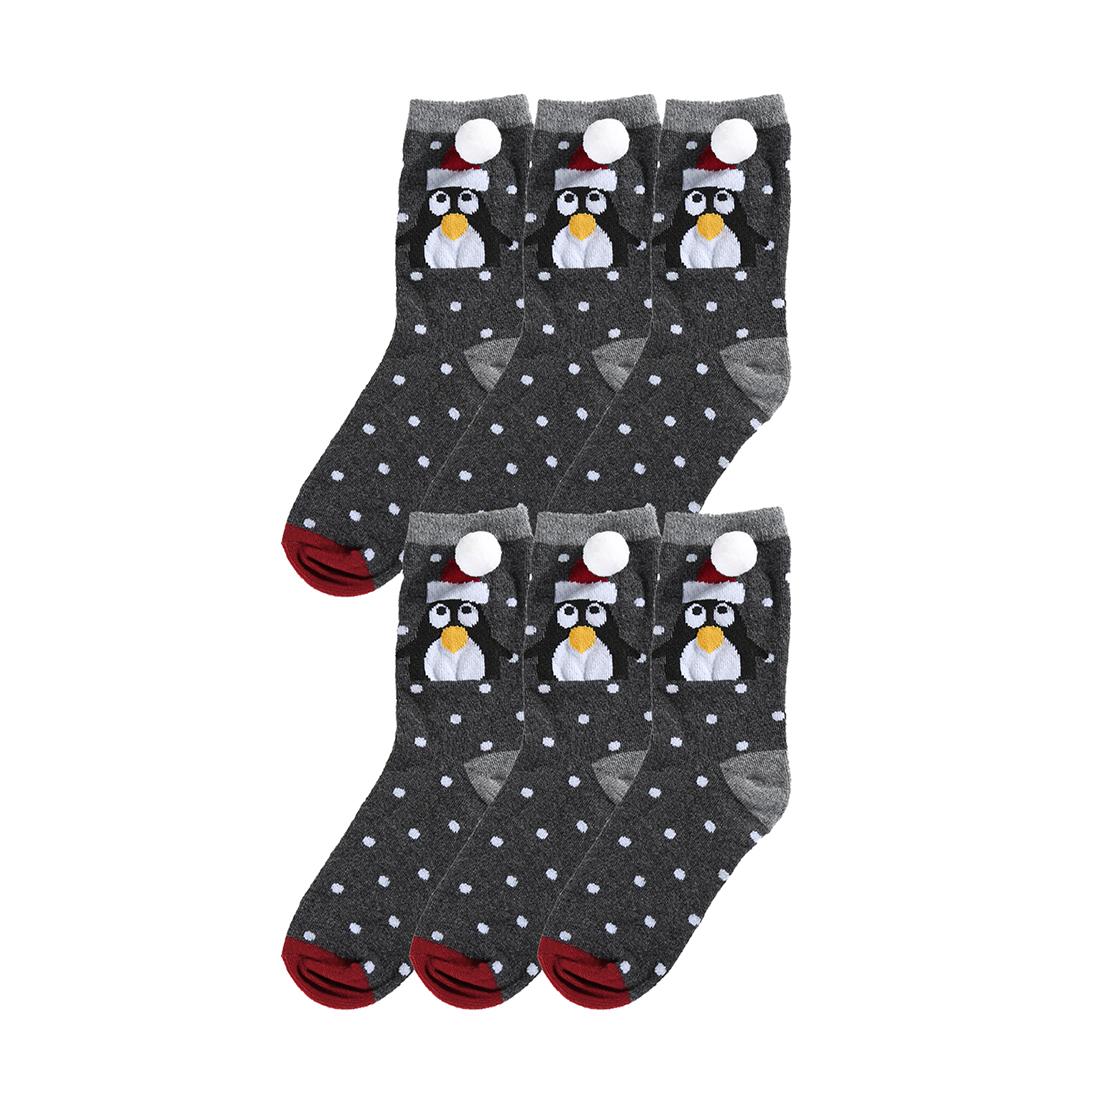 Christmas Kids\' Holiday Socks Cotton Baby Gift Cartoon 6 Pack Gray ...